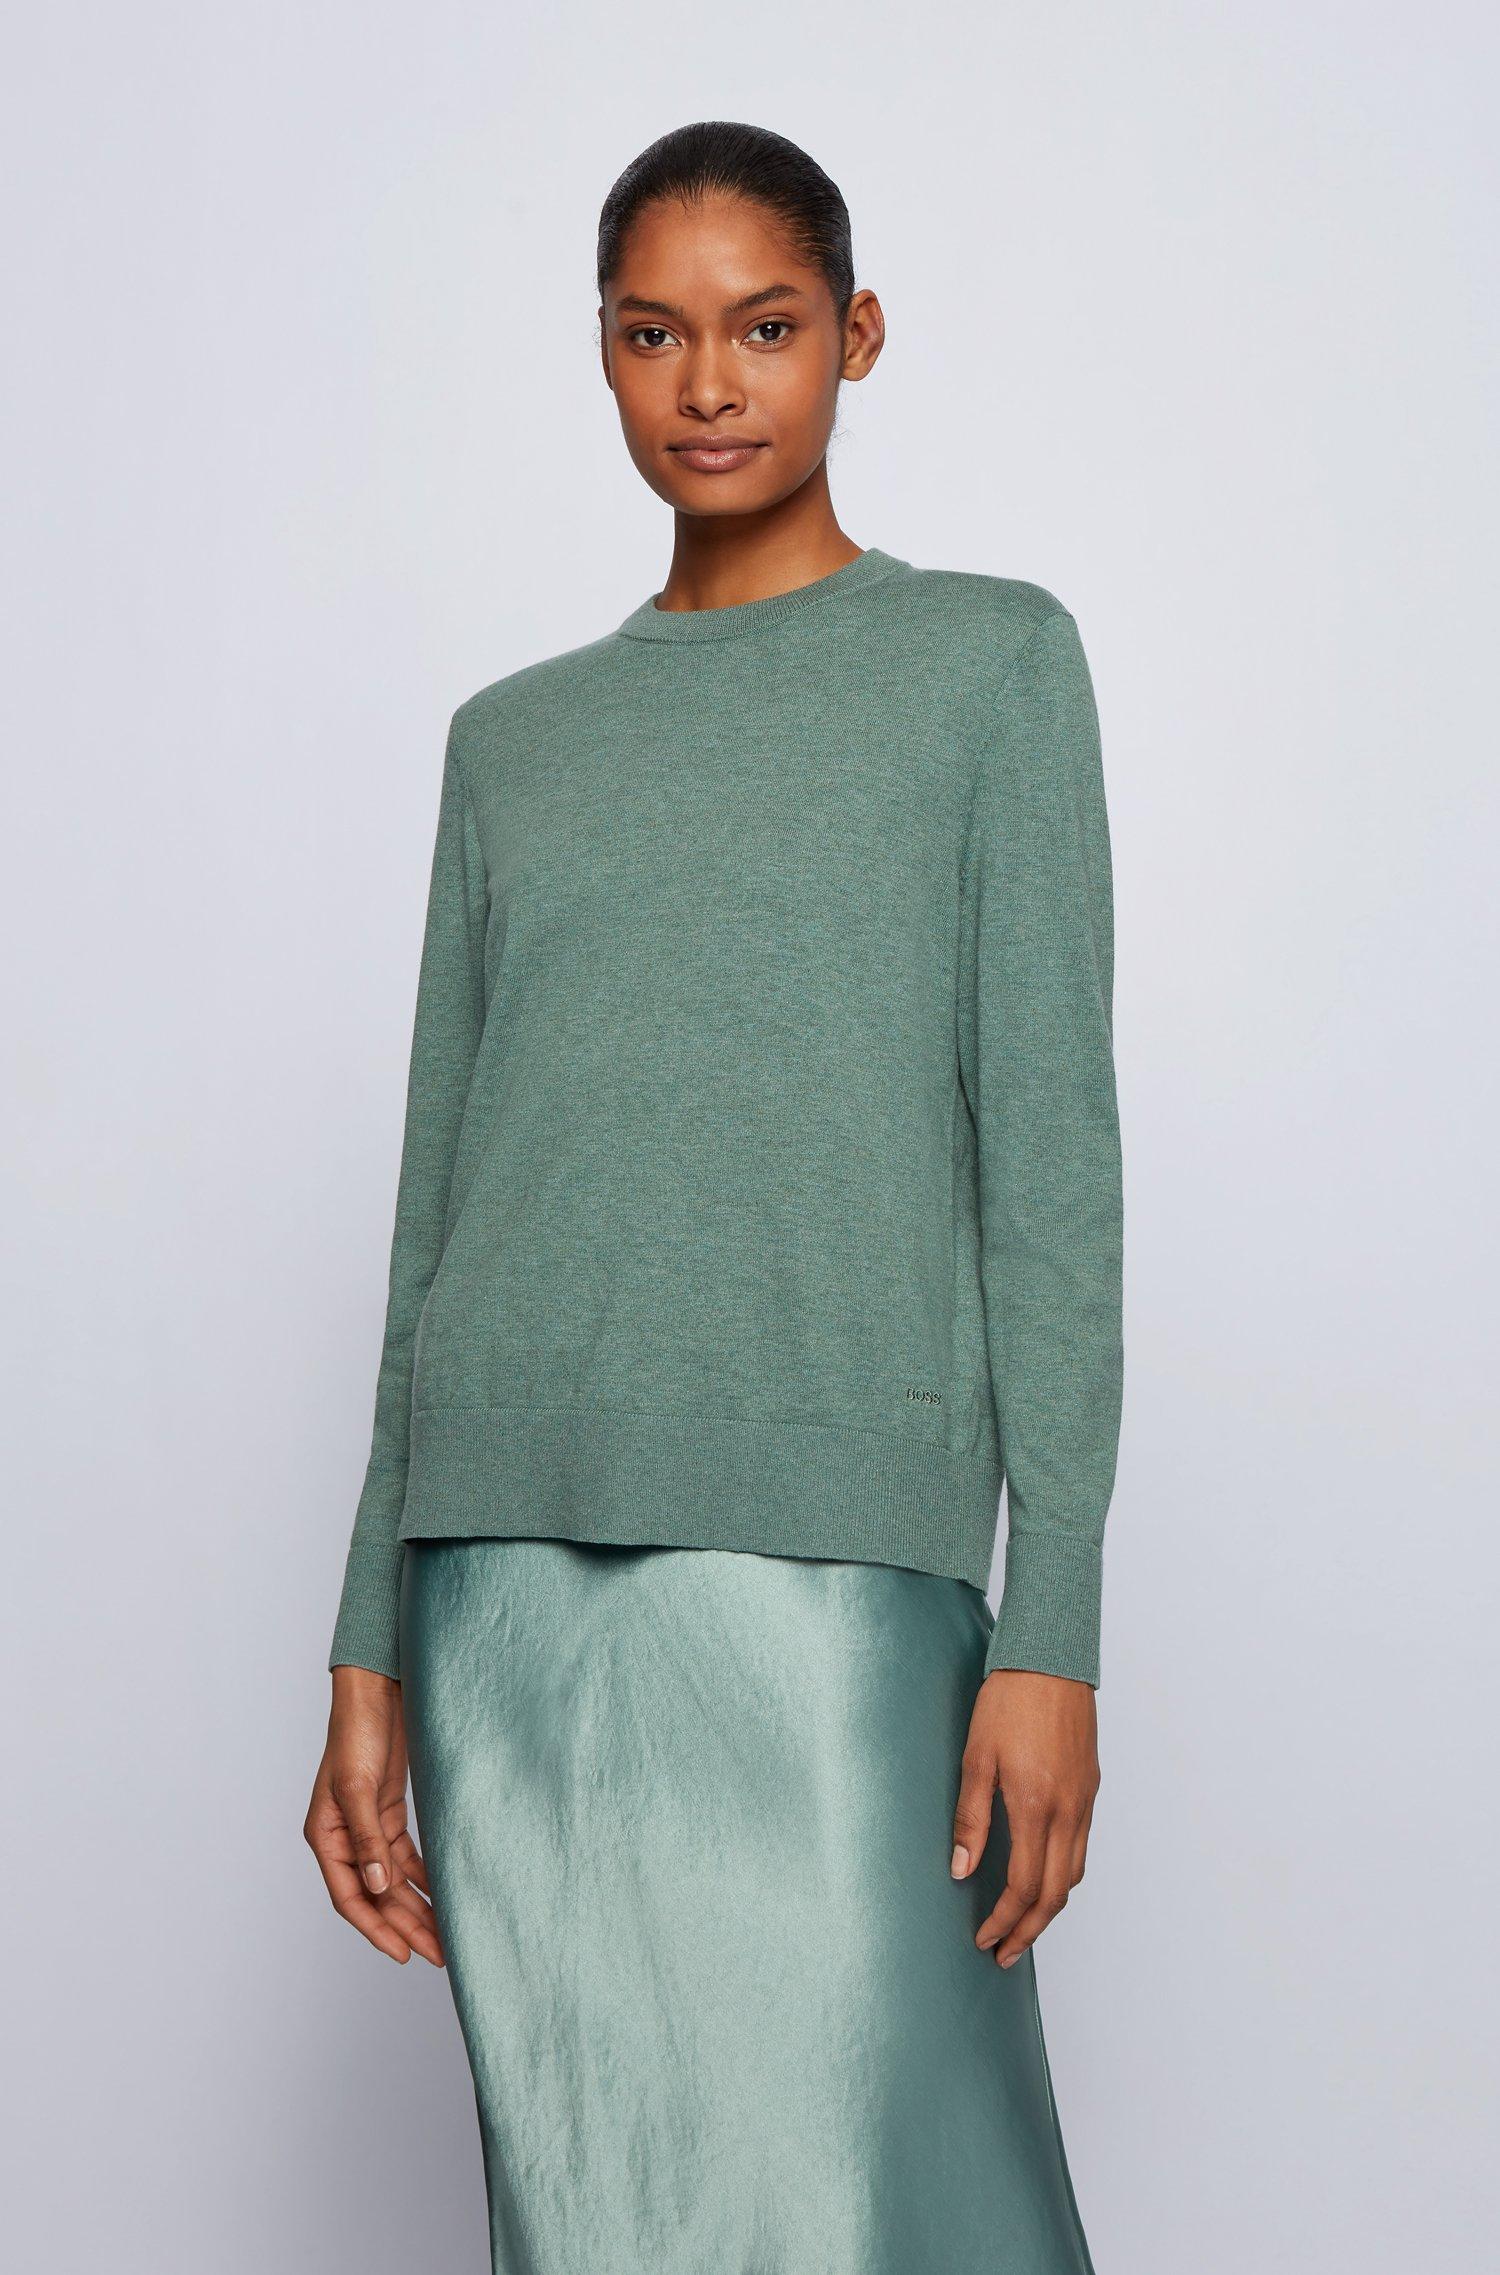 Relaxed-Fit Pullover aus Baumwoll-Mix mit Seide und Kaschmir, Hellgrün